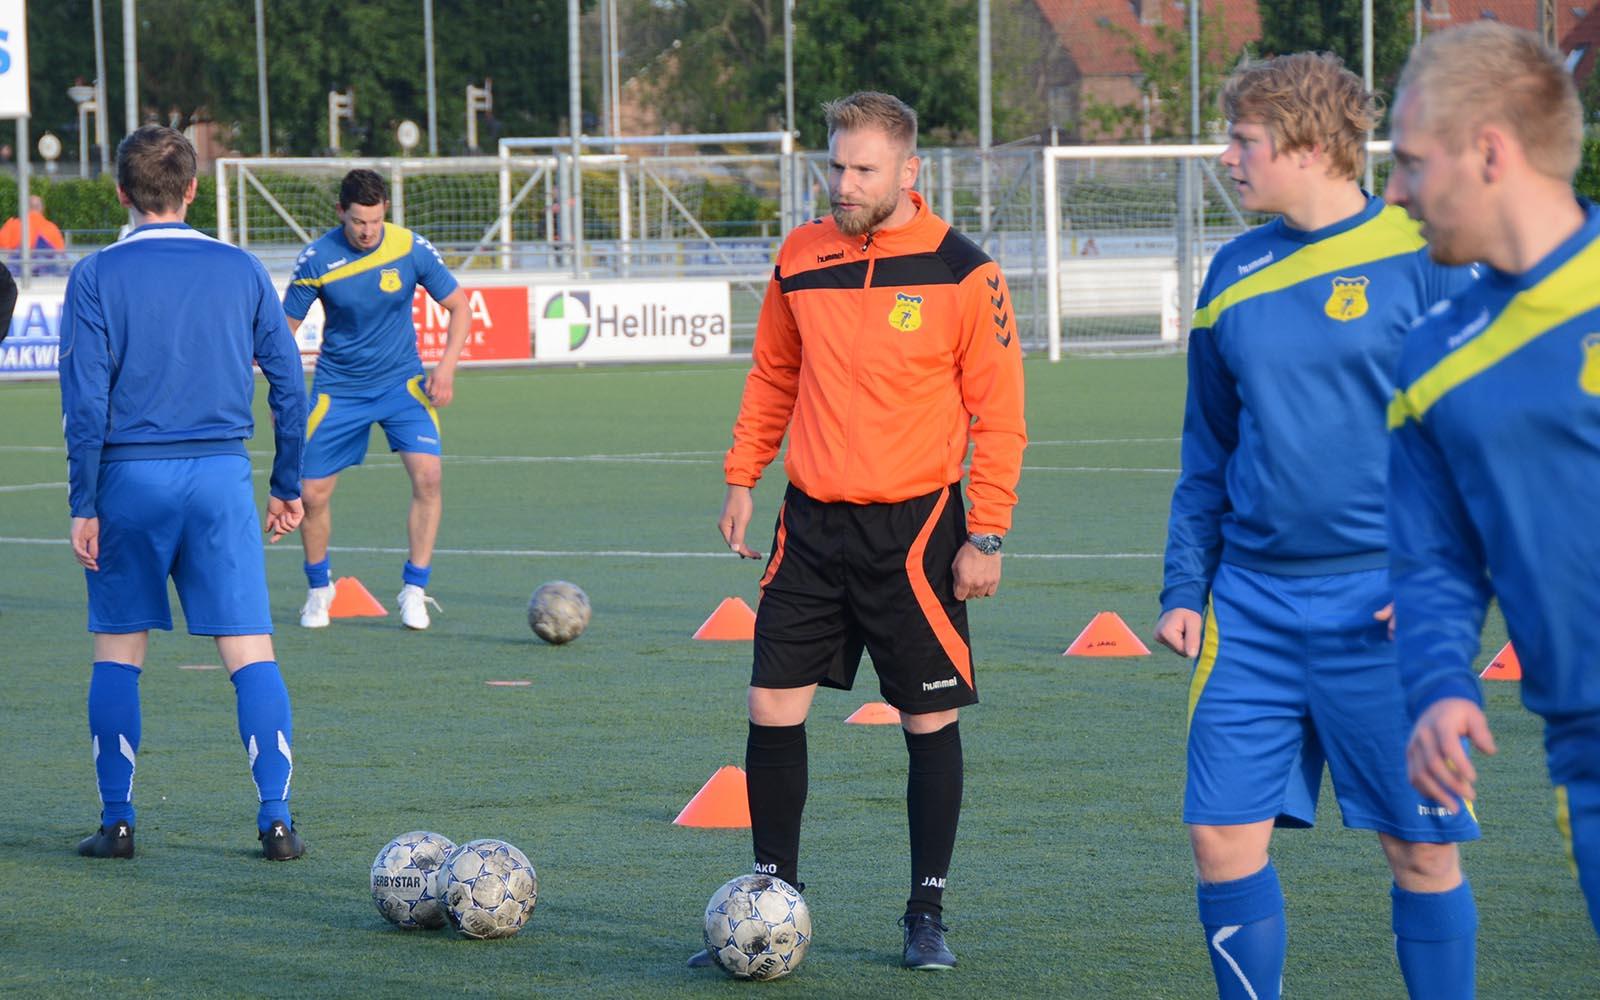 Willem Jan Talsma geslaagd voor UEFA-B